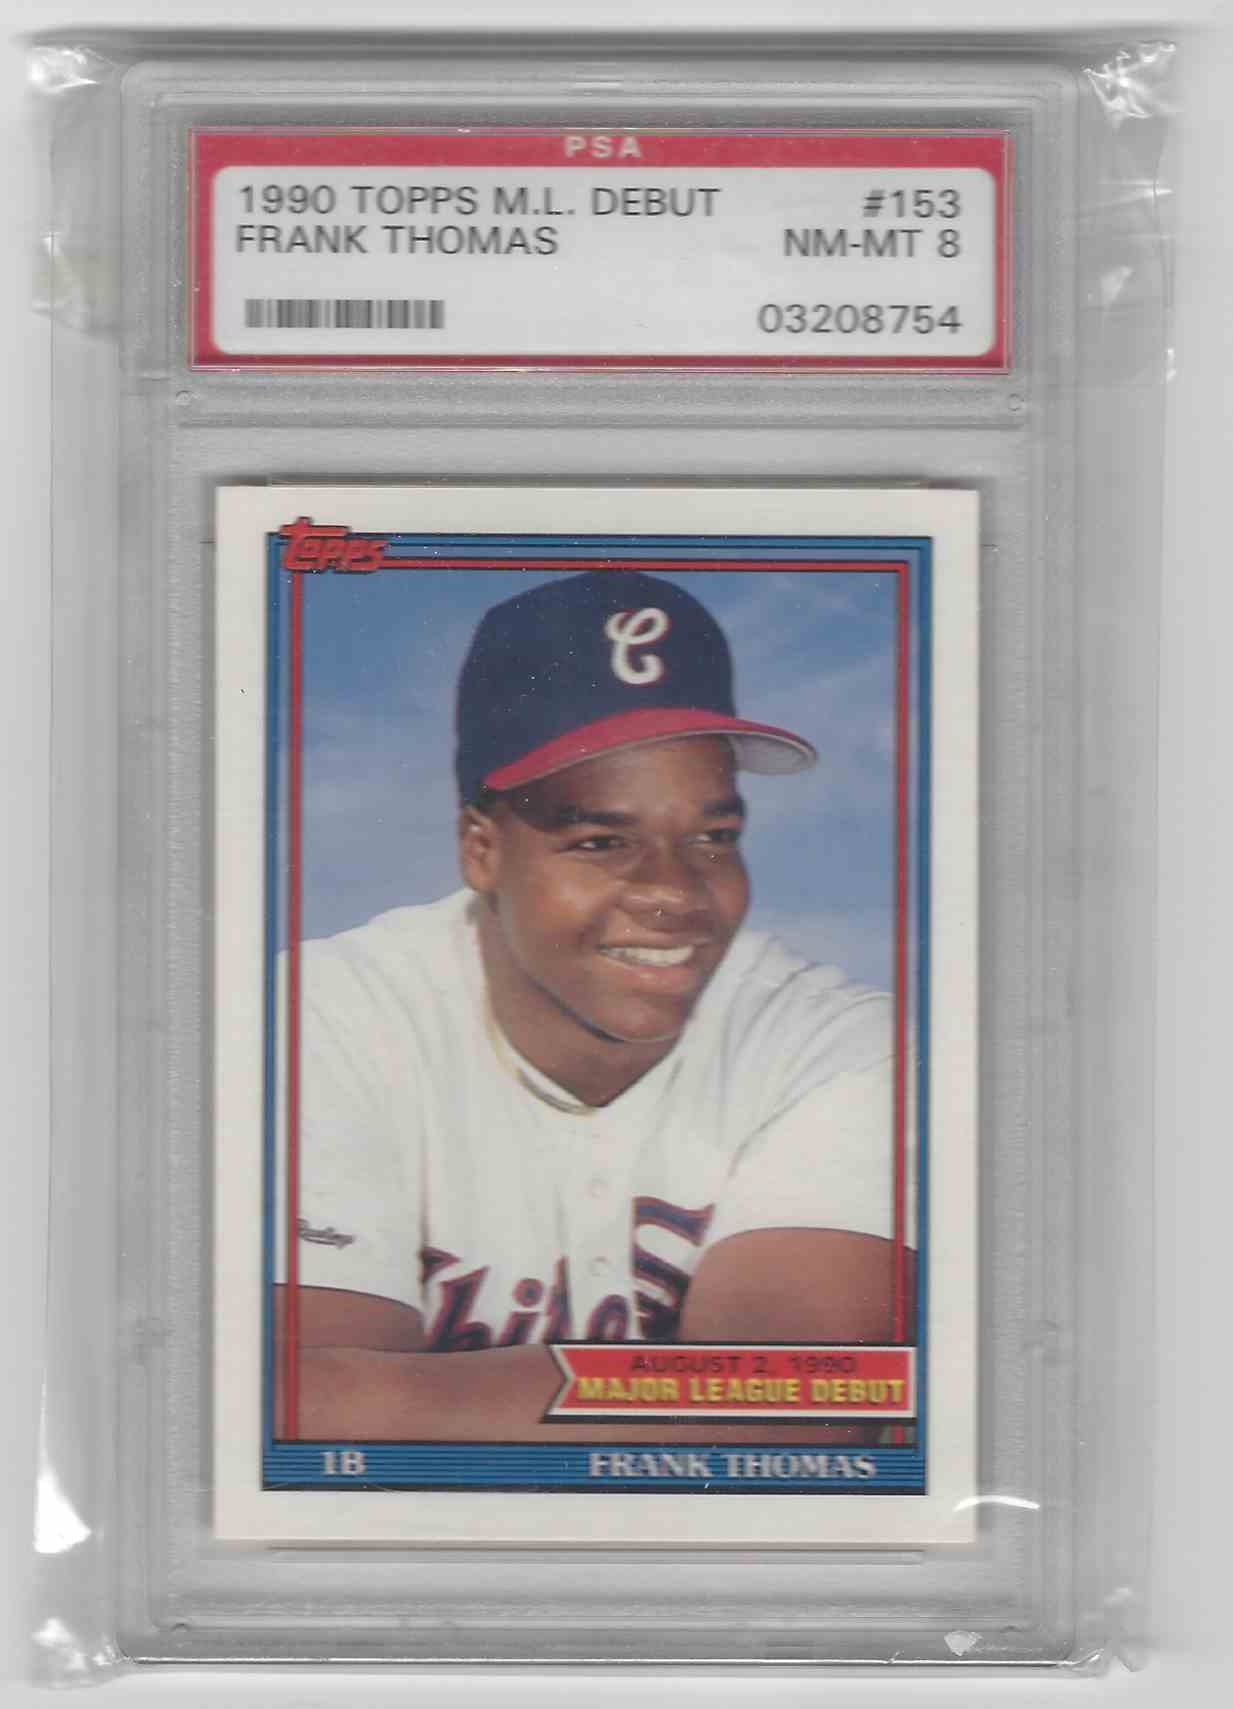 1990 Topps Major League Debut Frank Thomas 153 On Kronozio